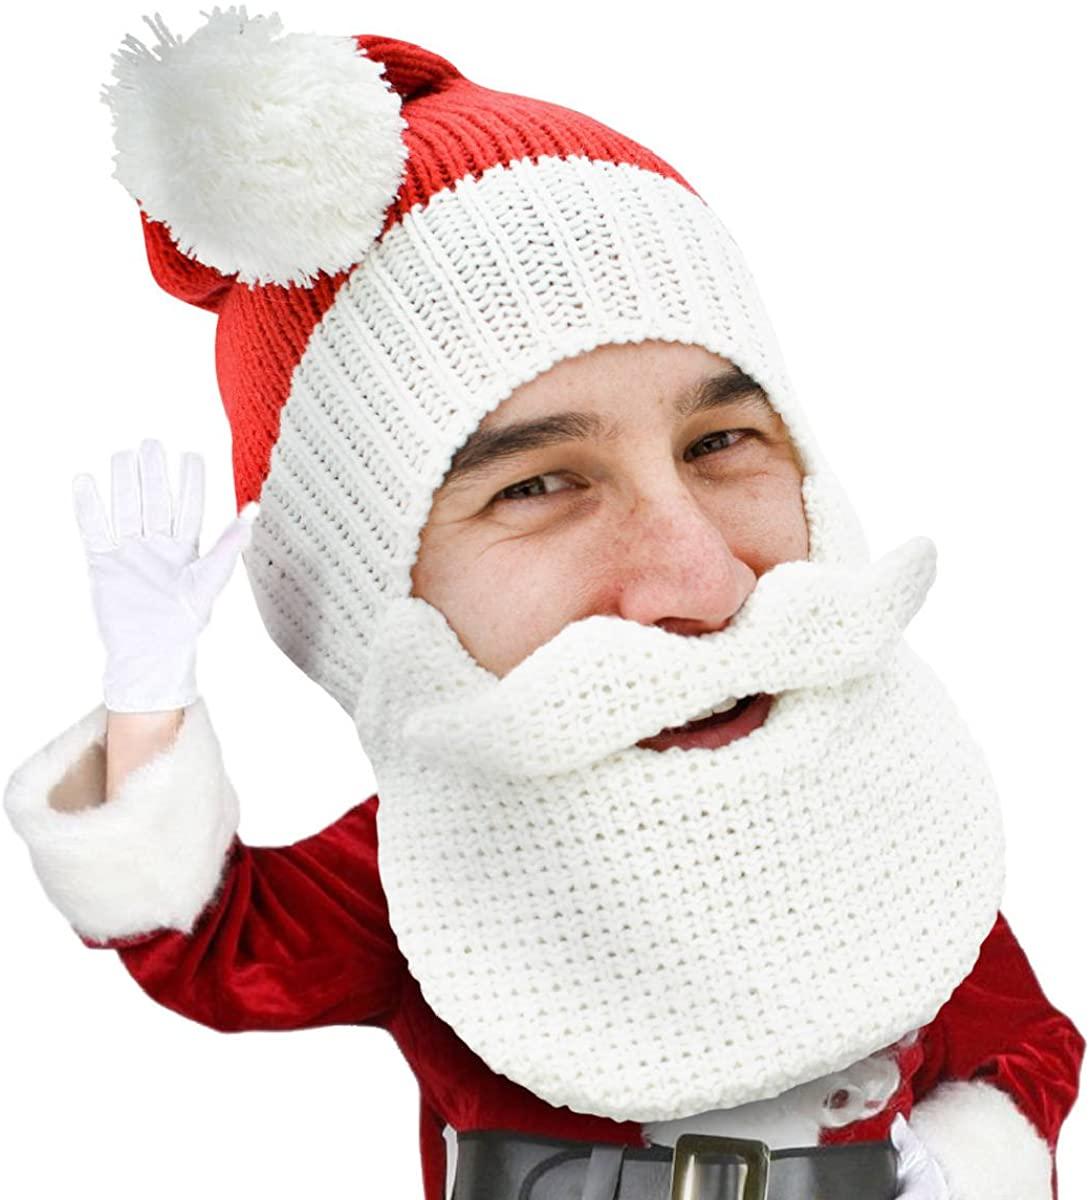 Beard Head Knitted Santa Beard Hat with Classic Funny Christmas Beard Costume